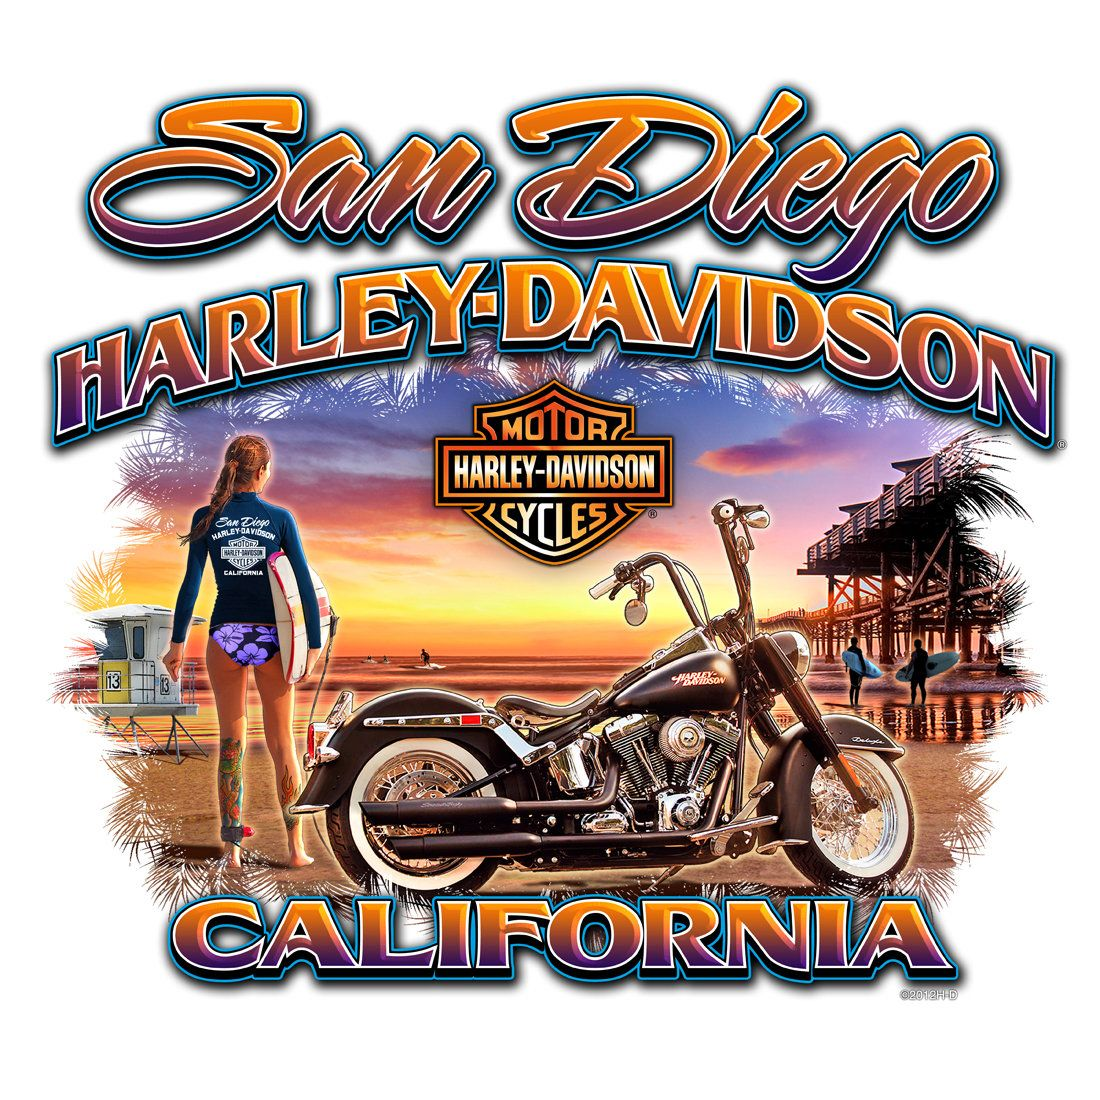 Pin By Rodrigo On Harley Davidson Harley Davidson Artwork Harley Davidson Dealership Harley Davidson